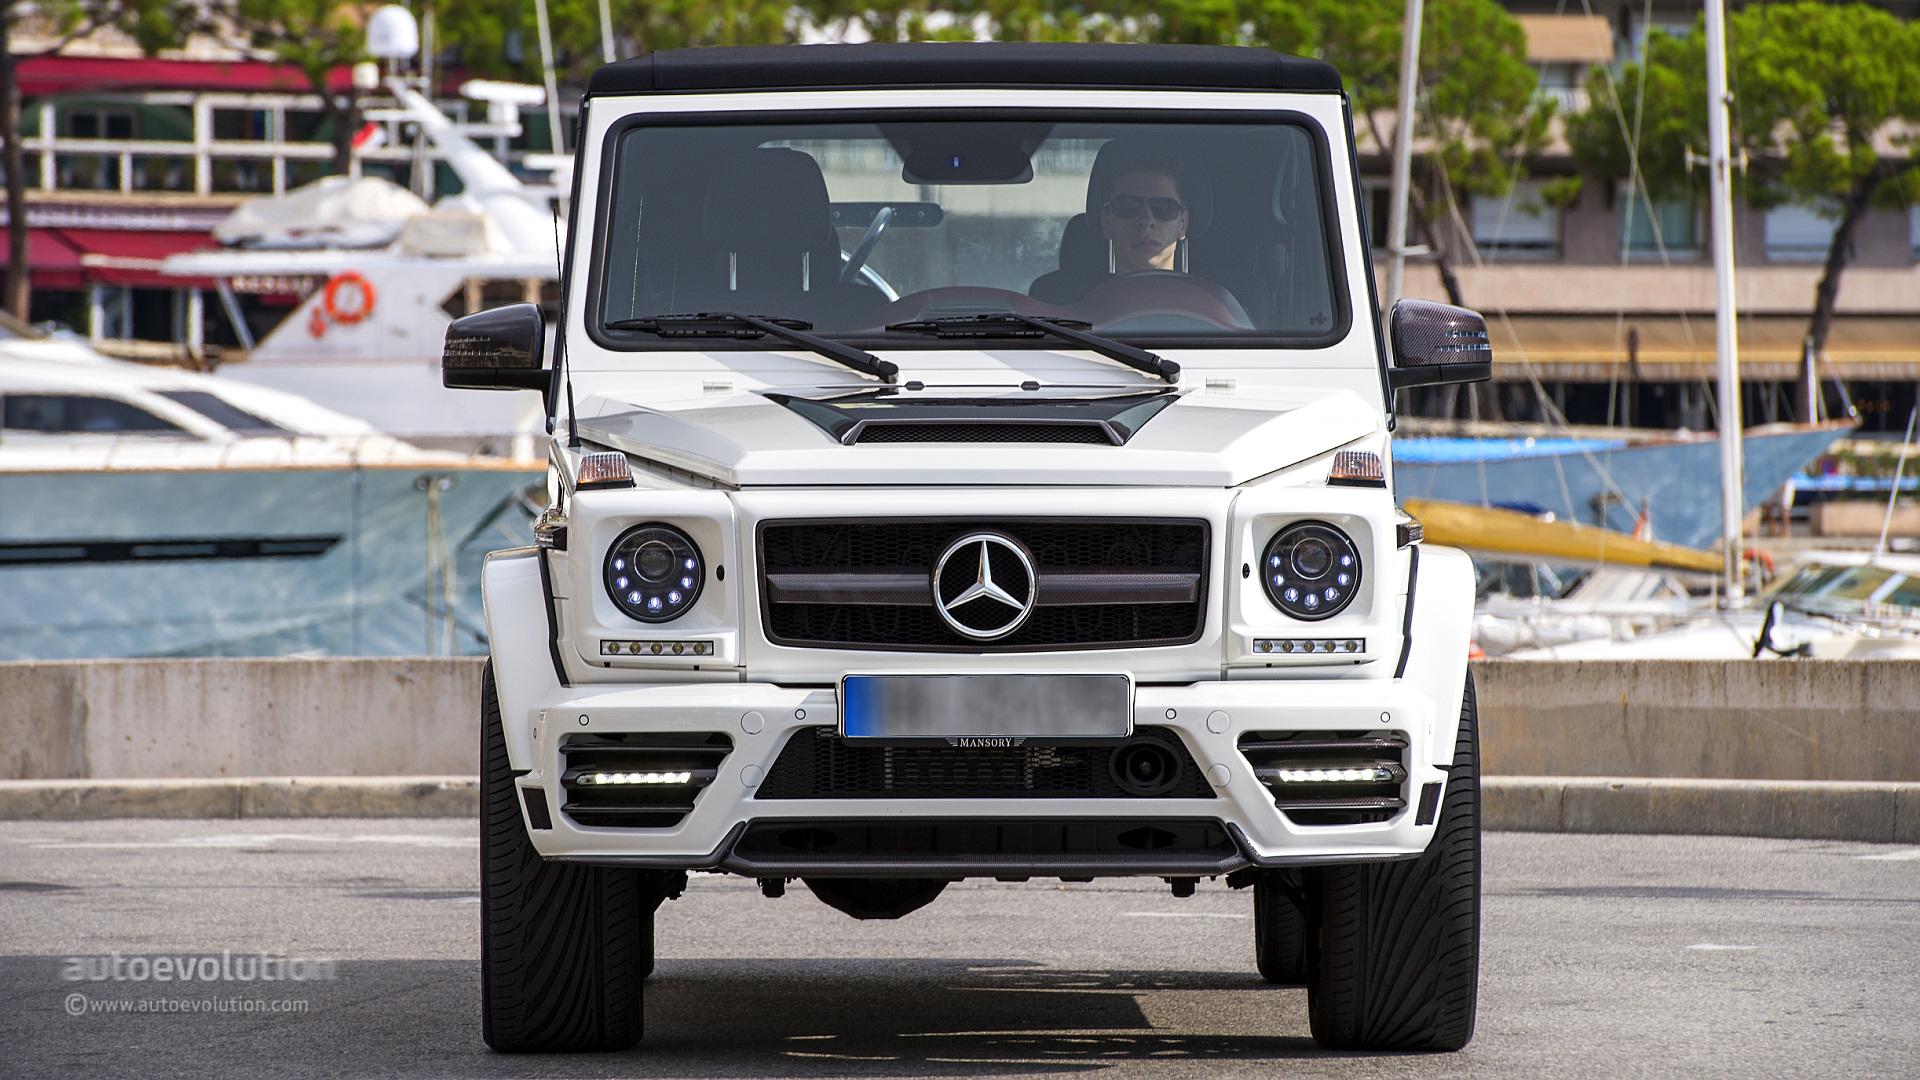 Mercedes benz g500 cabriolet review autoevolution for Mercedes benz 6500